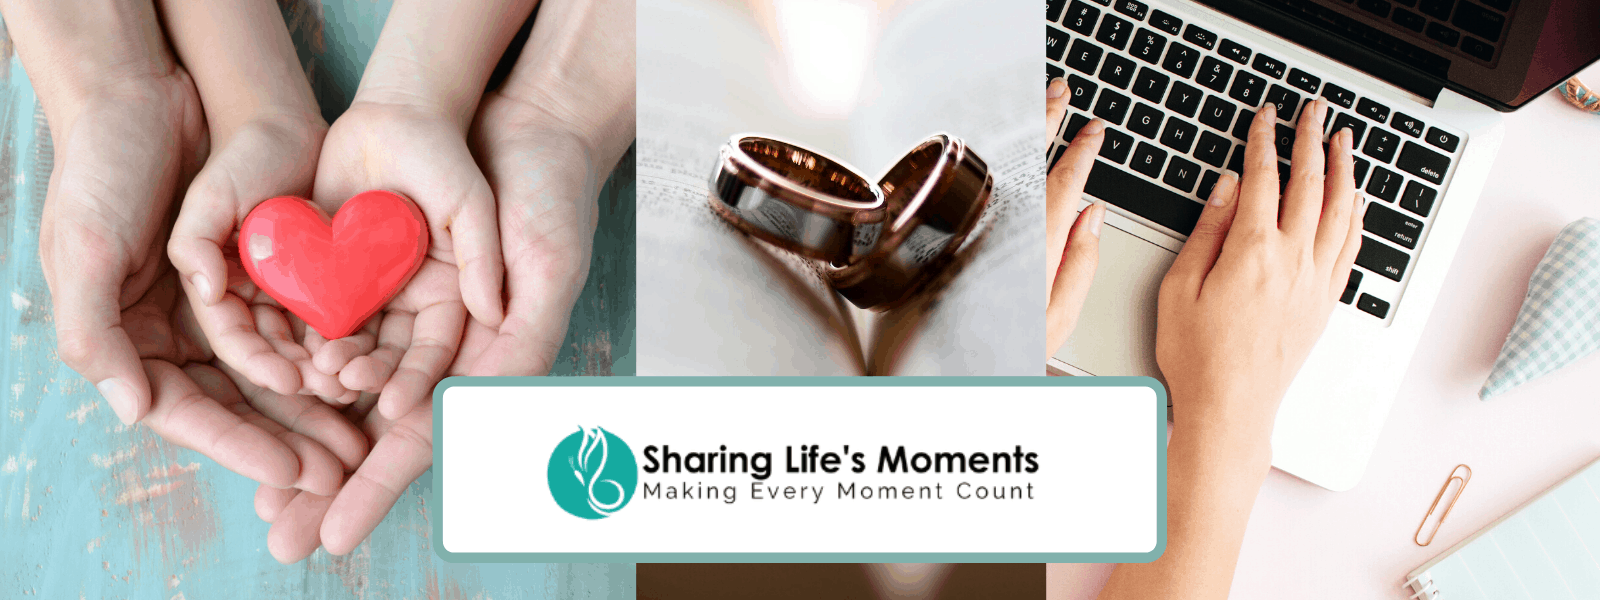 Sharing Life's Moments